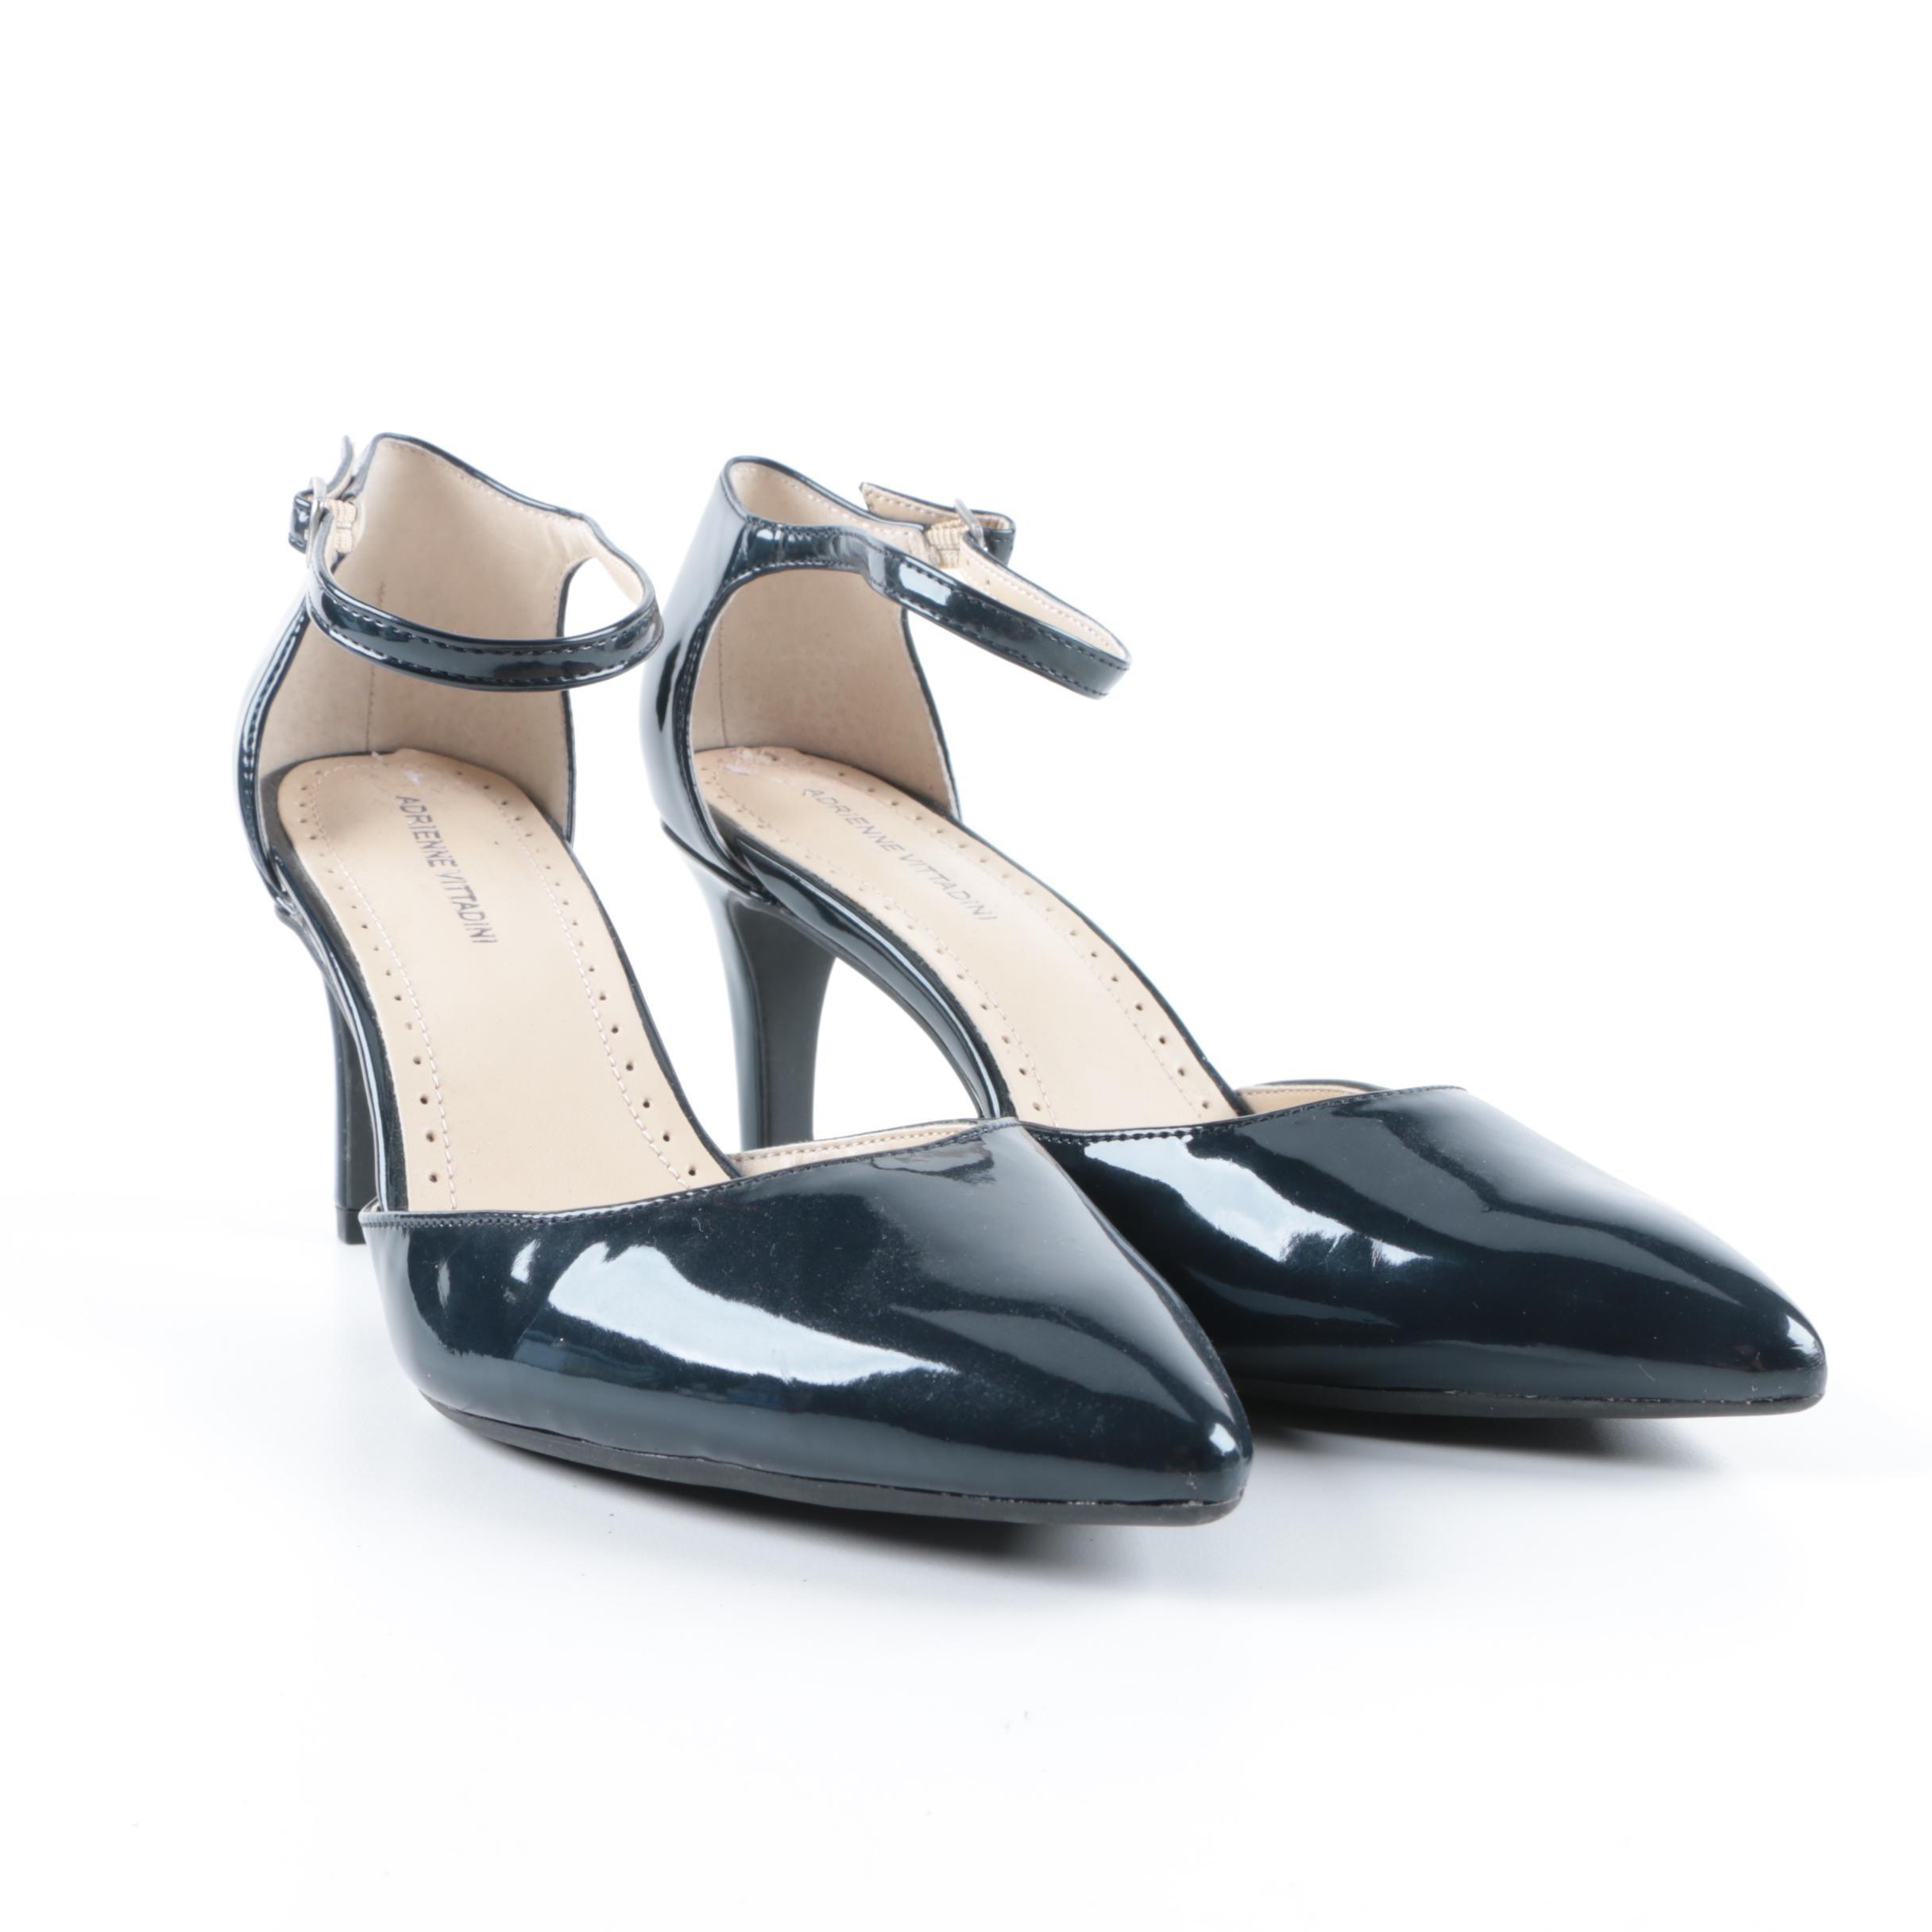 Women's Adrienne Vittadini d'Orsay High Heels